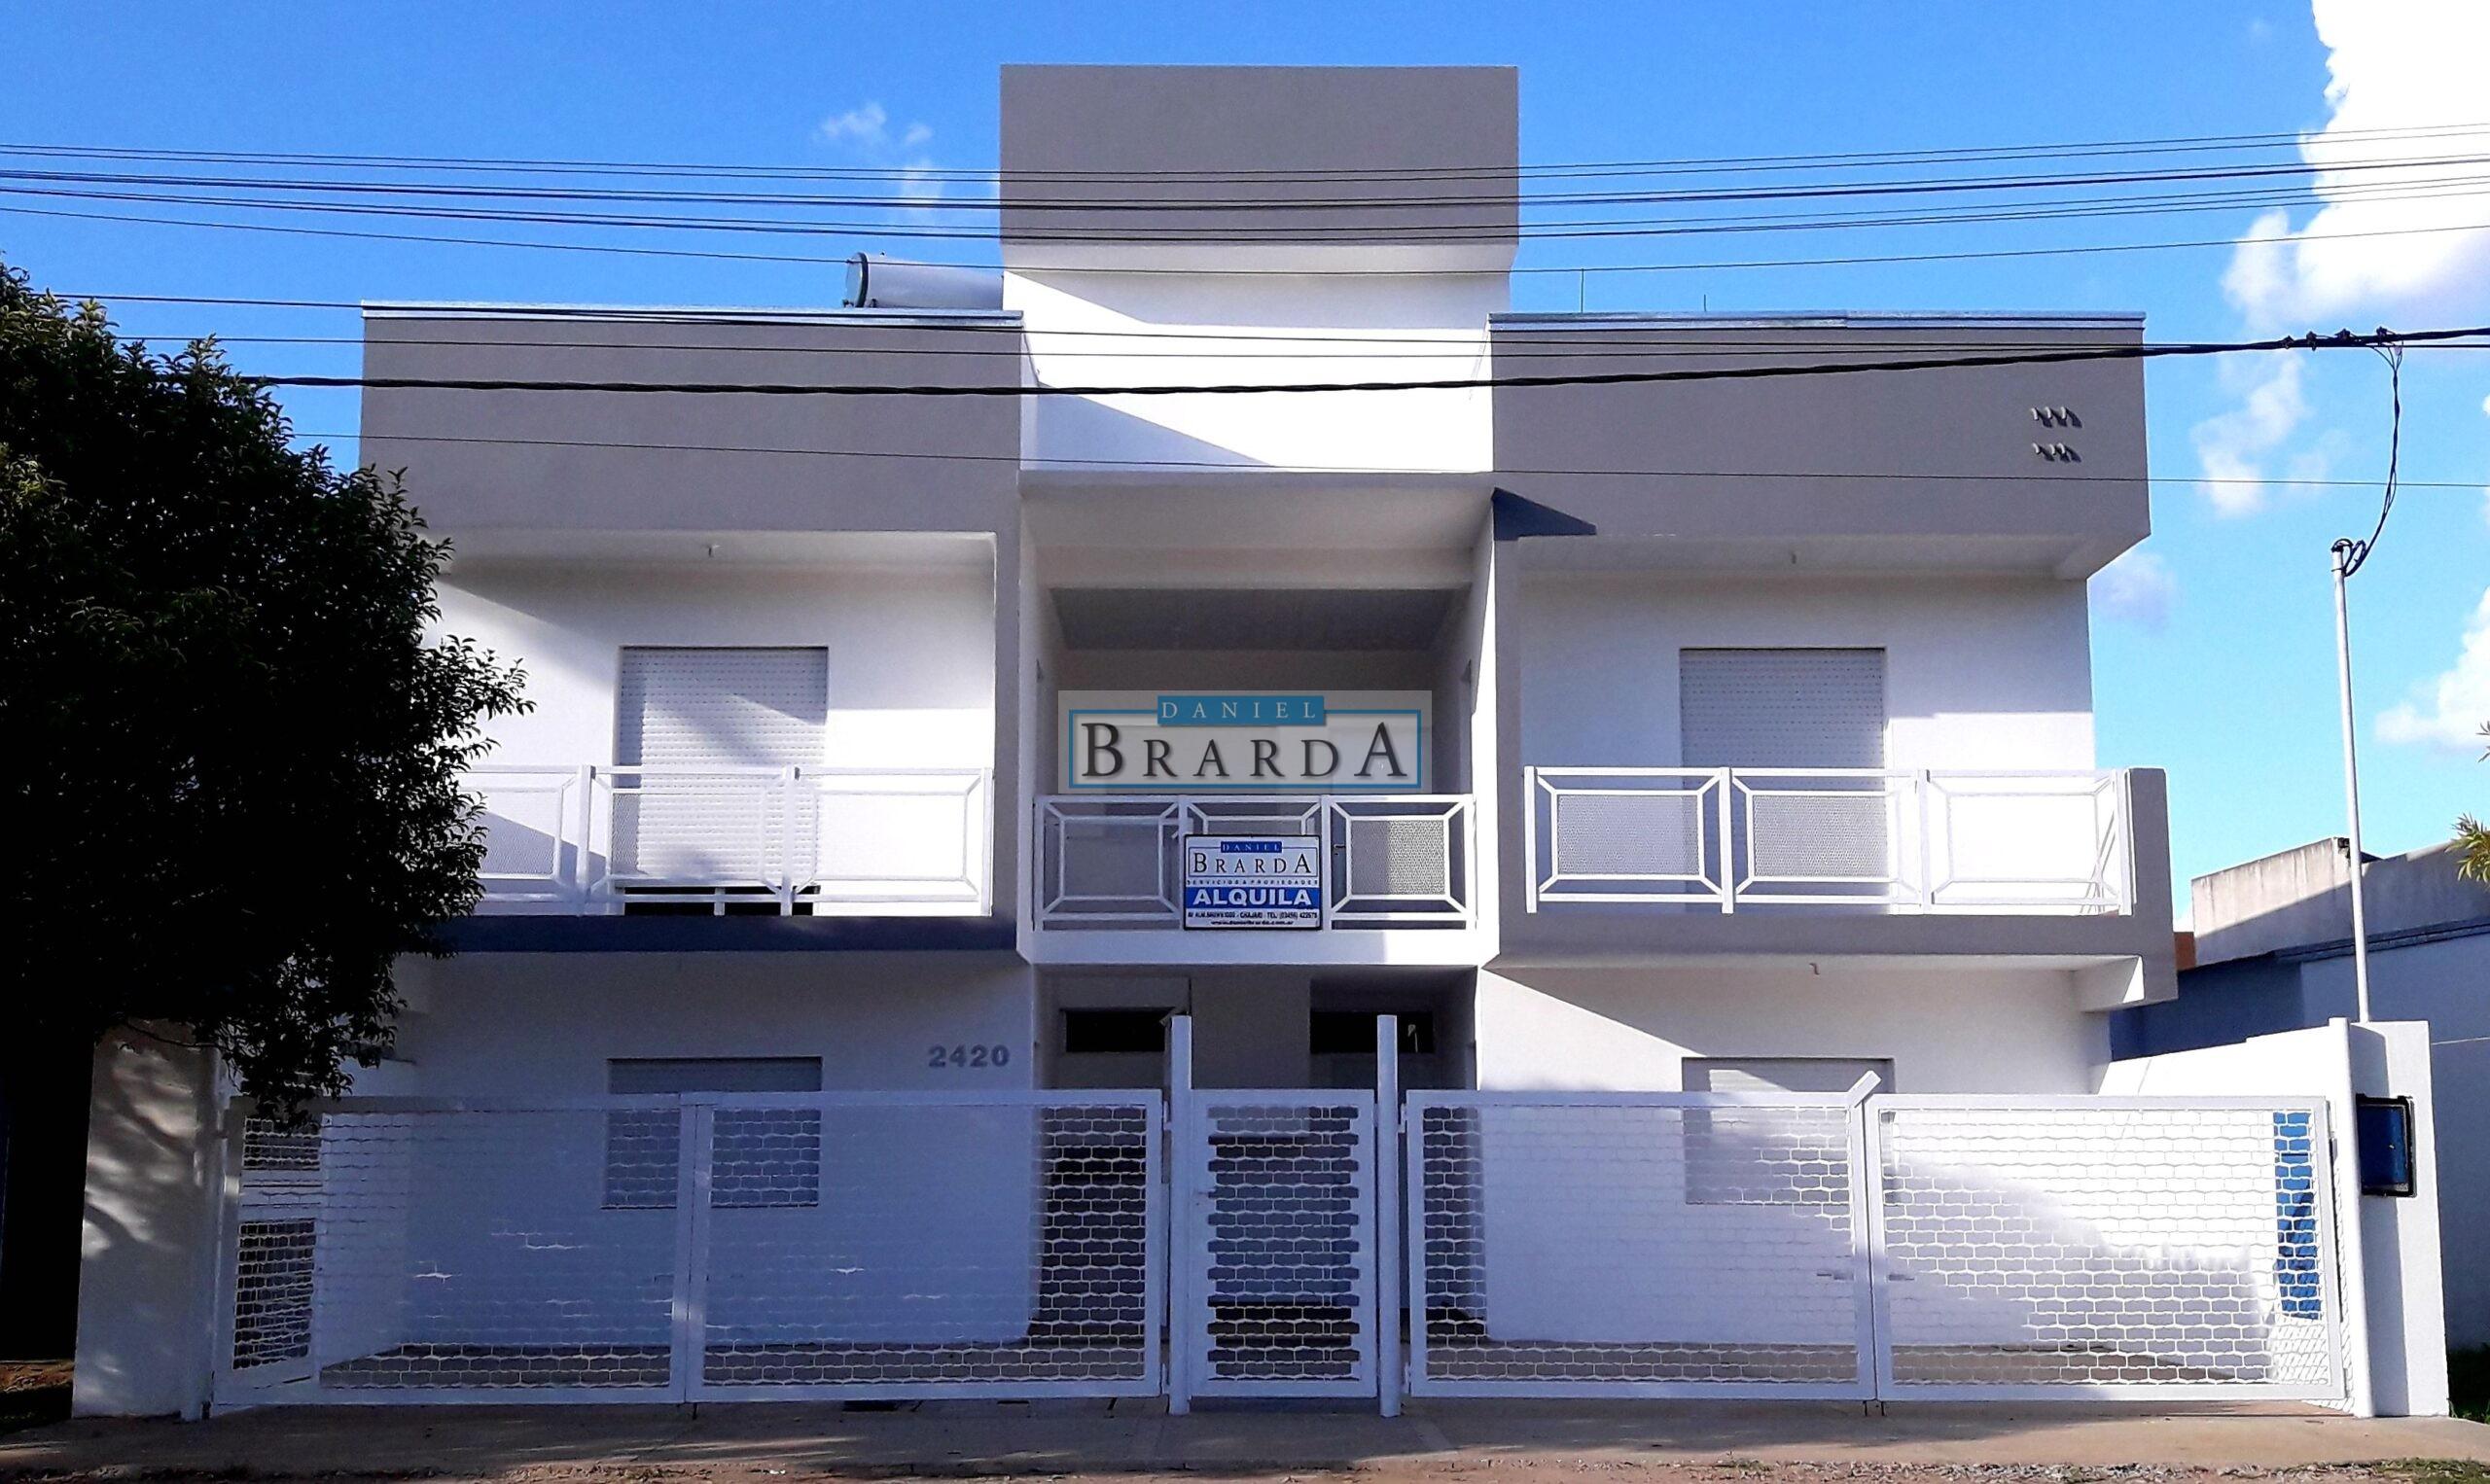 Departamento 6 (1 dormitorio) – Alte. Brown 2420 Chajari (ER)